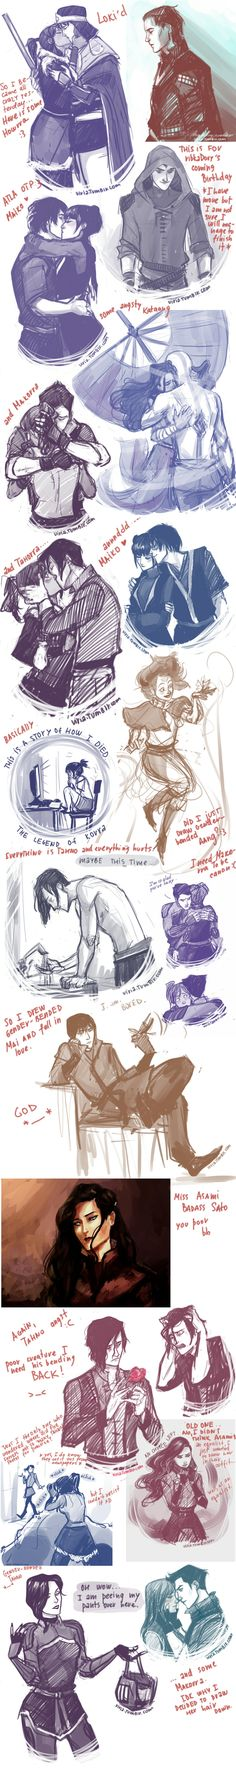 Avatar sketch dump - viria.  I am beginning to love Tahno even more. I need the next season n he BETTER be a main part!